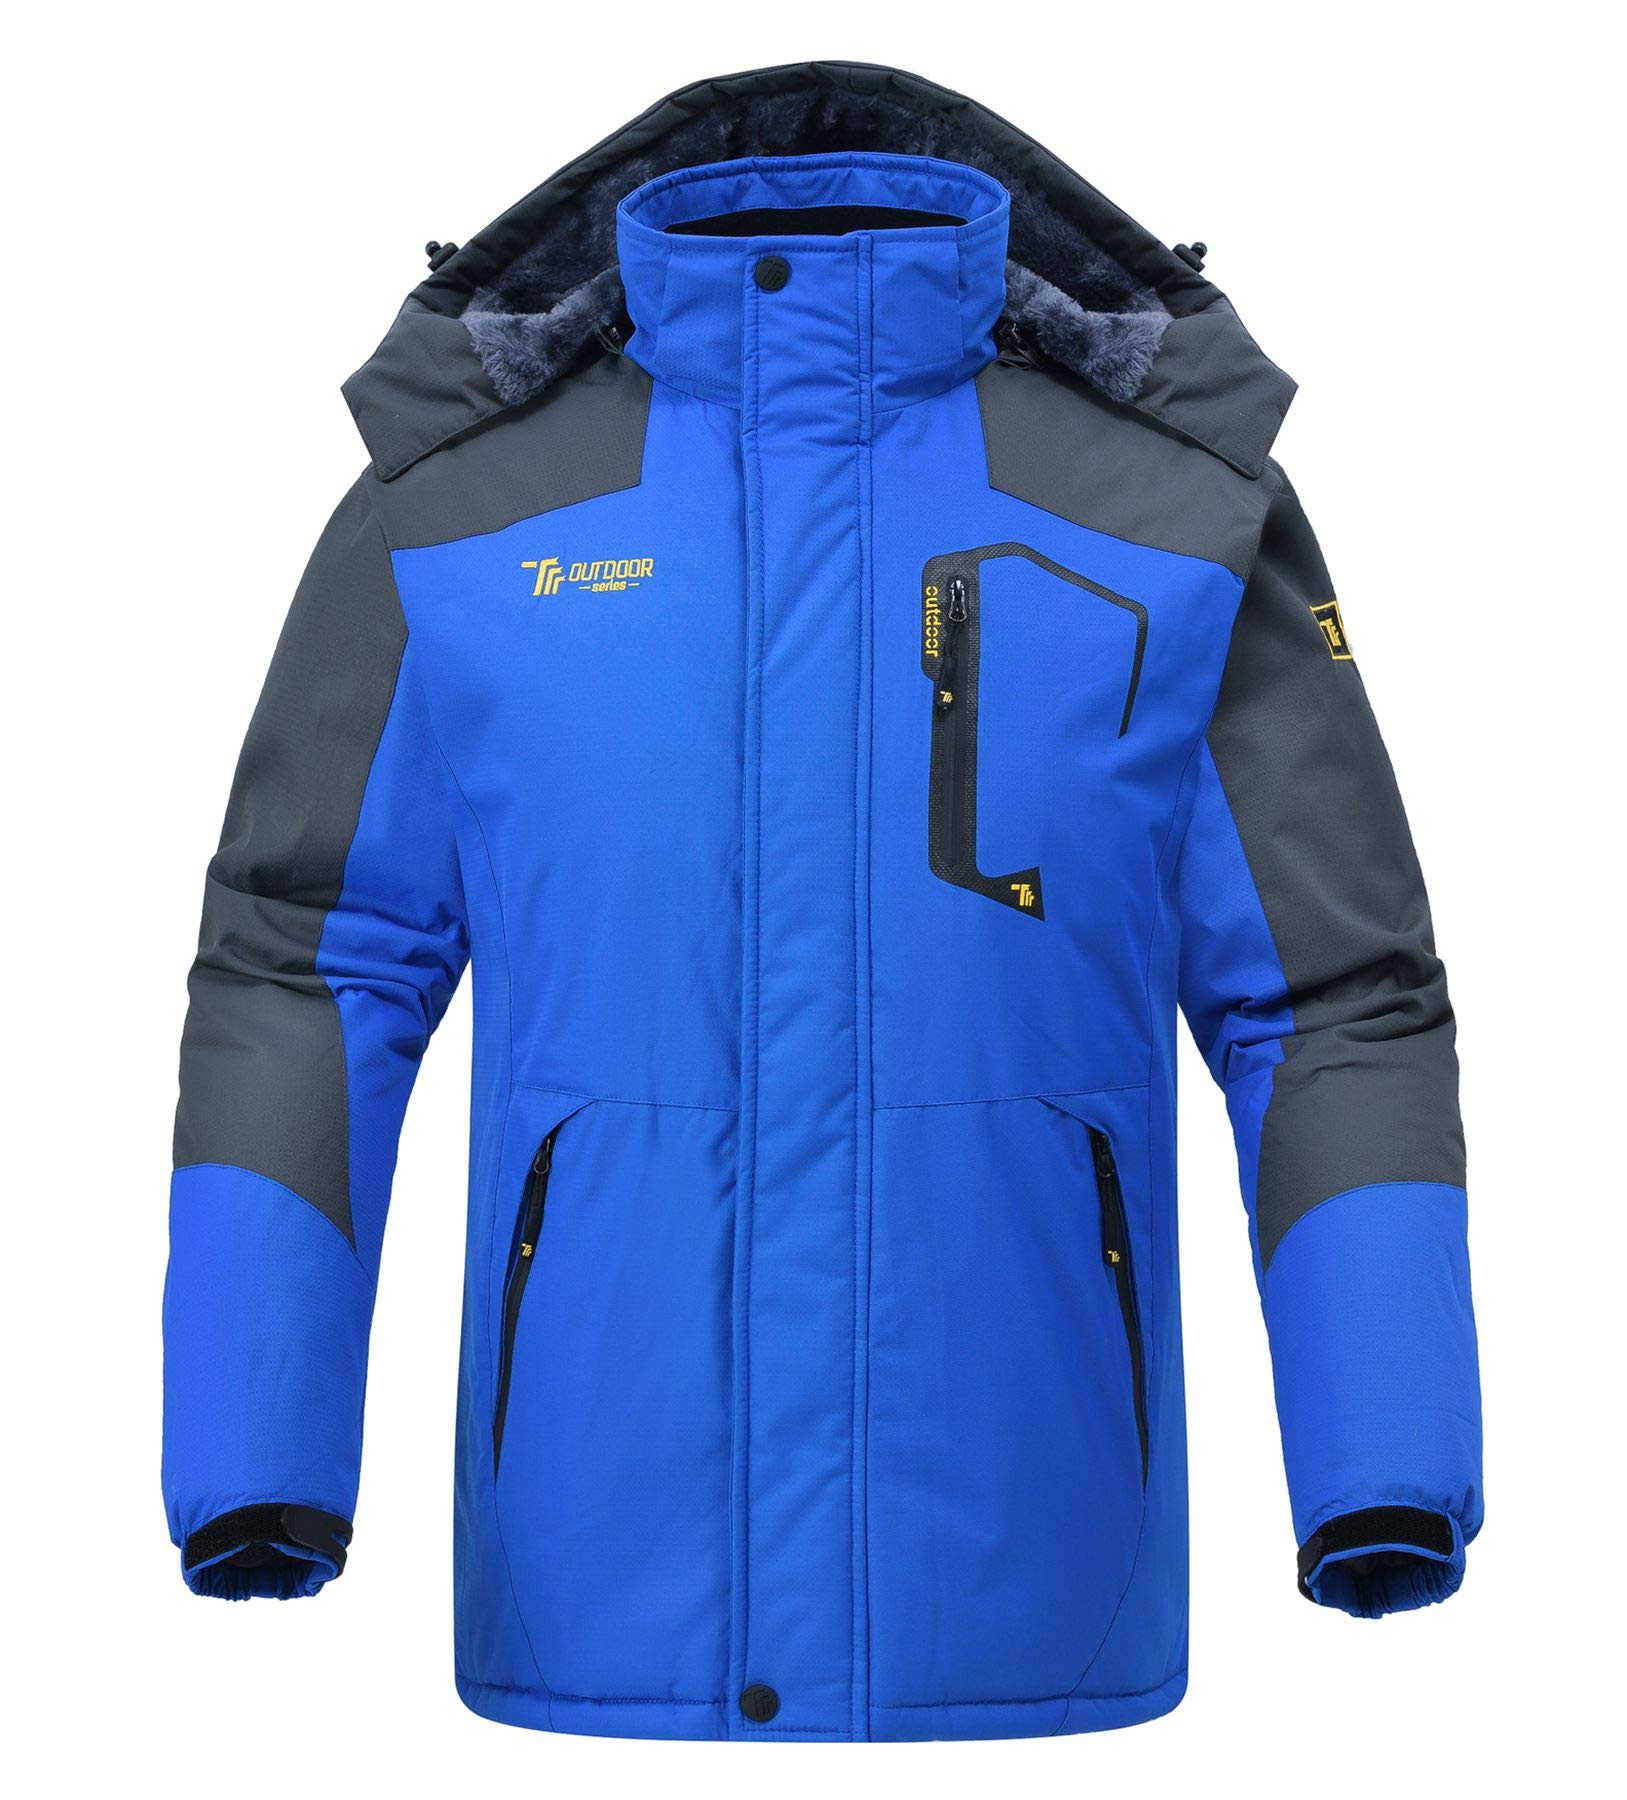 Rdruko Men's Winter Snow Jacket Coat Waterproof Windproof Insulated Ski Snowboard Fleece Jacket(Blue, US M) by Rdruko